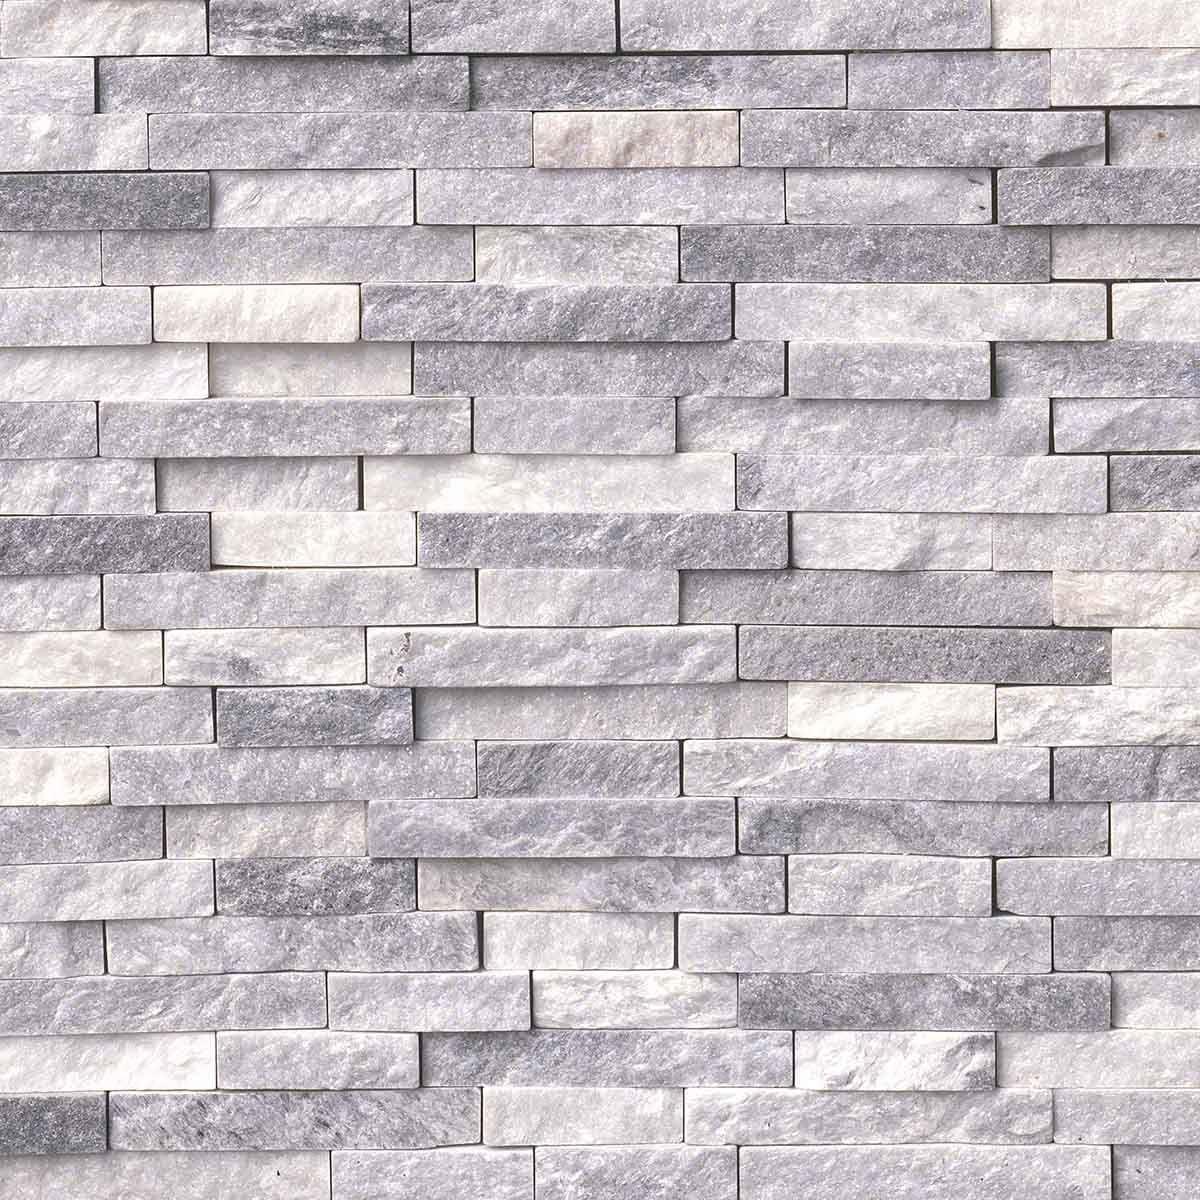 Best Chicago South Side 4X8 Reclaimed Brick Look Porcelain Tile 400 x 300